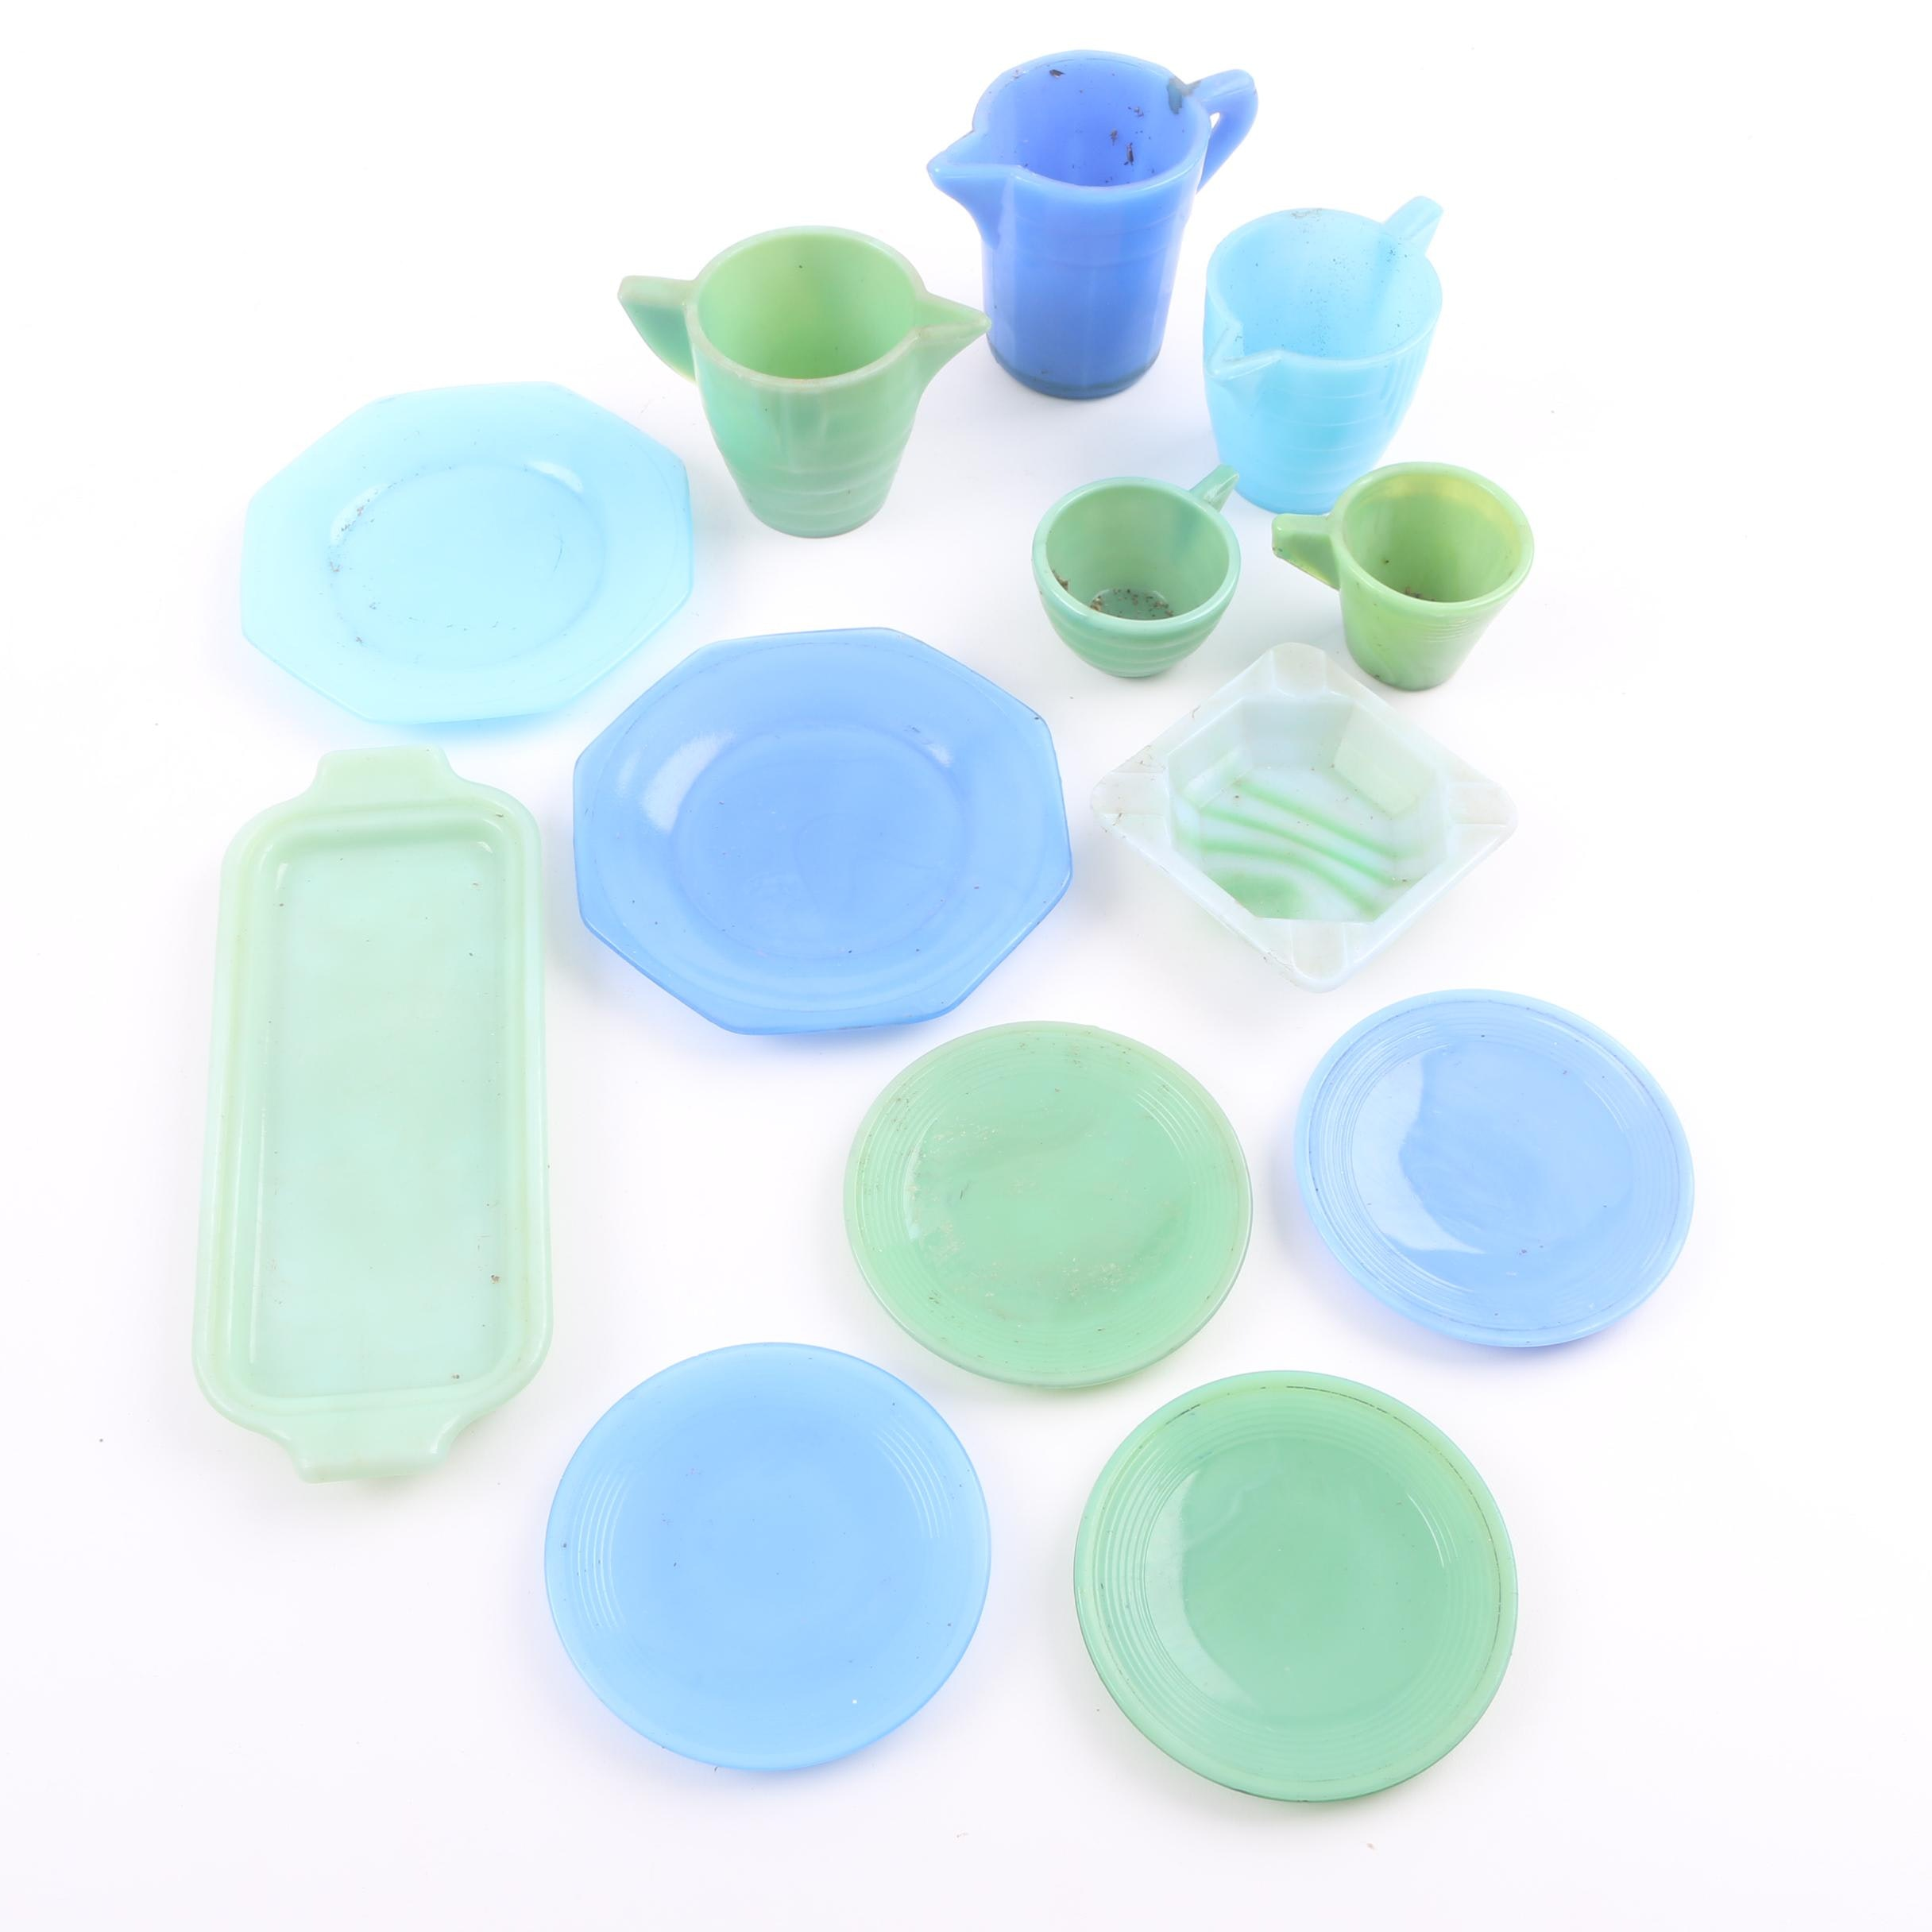 Opaque Glass Tableware Including Fire King Jadeite Glass